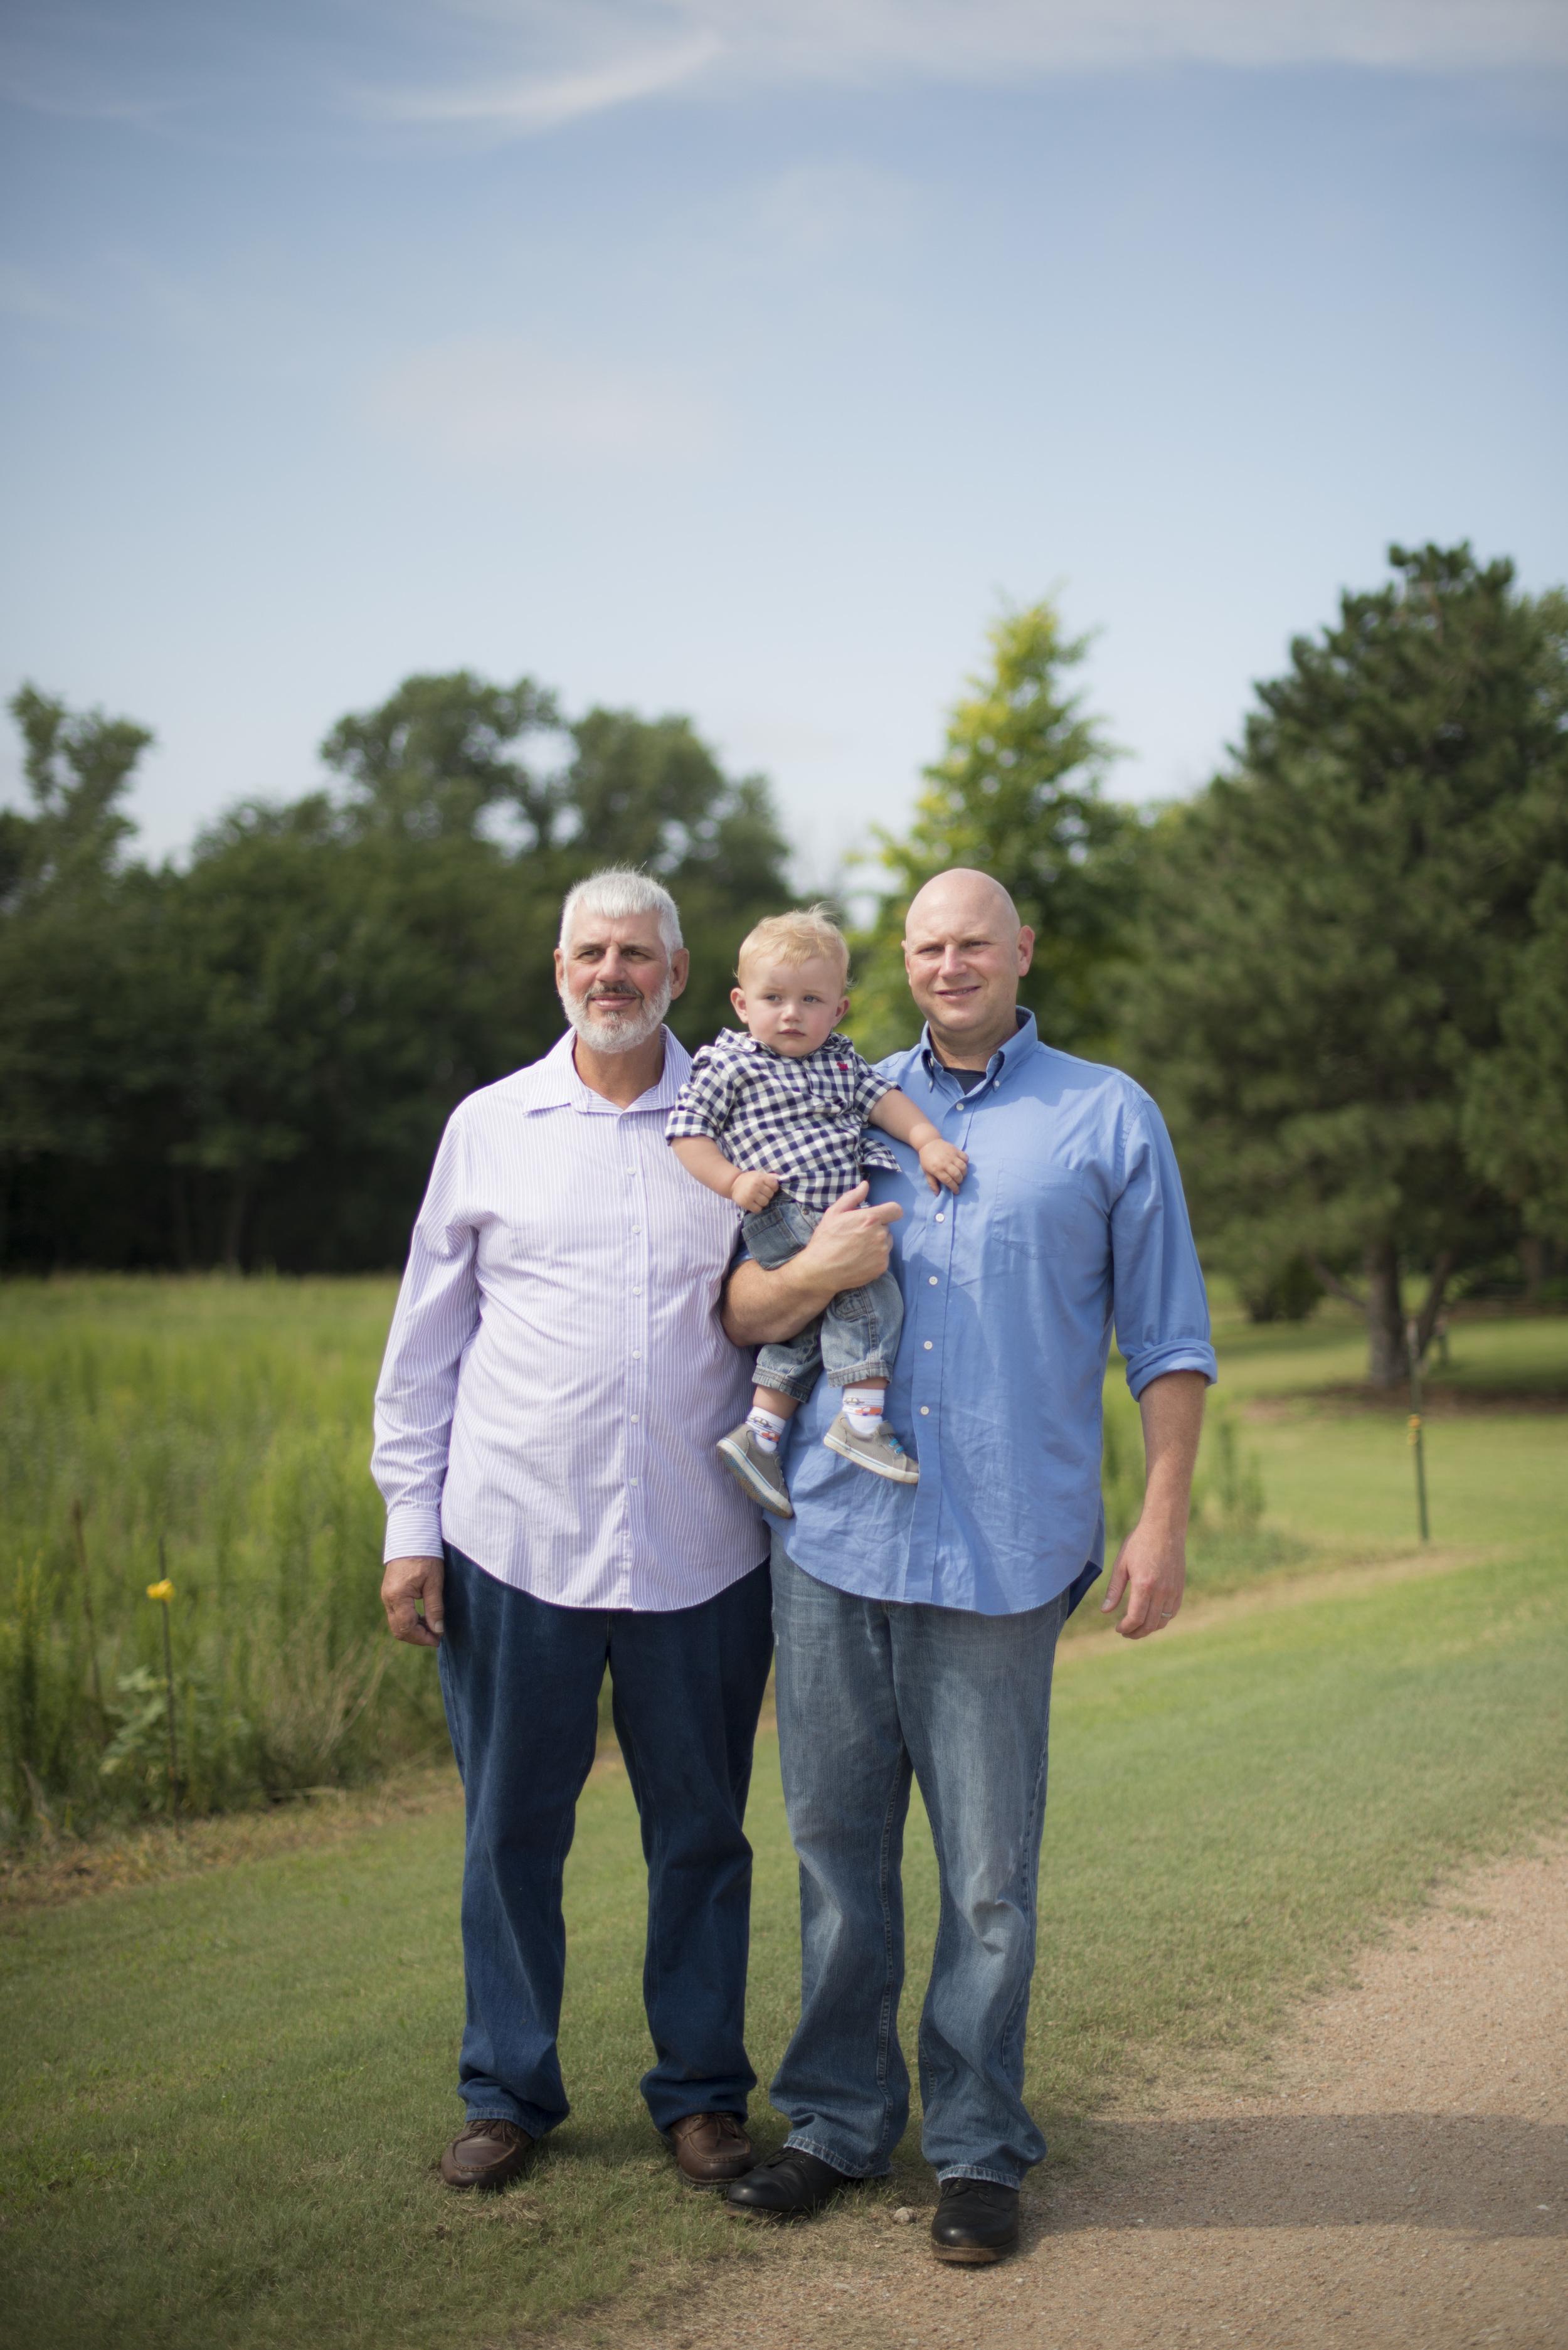 Hampel Family - JWild Photography70.jpg